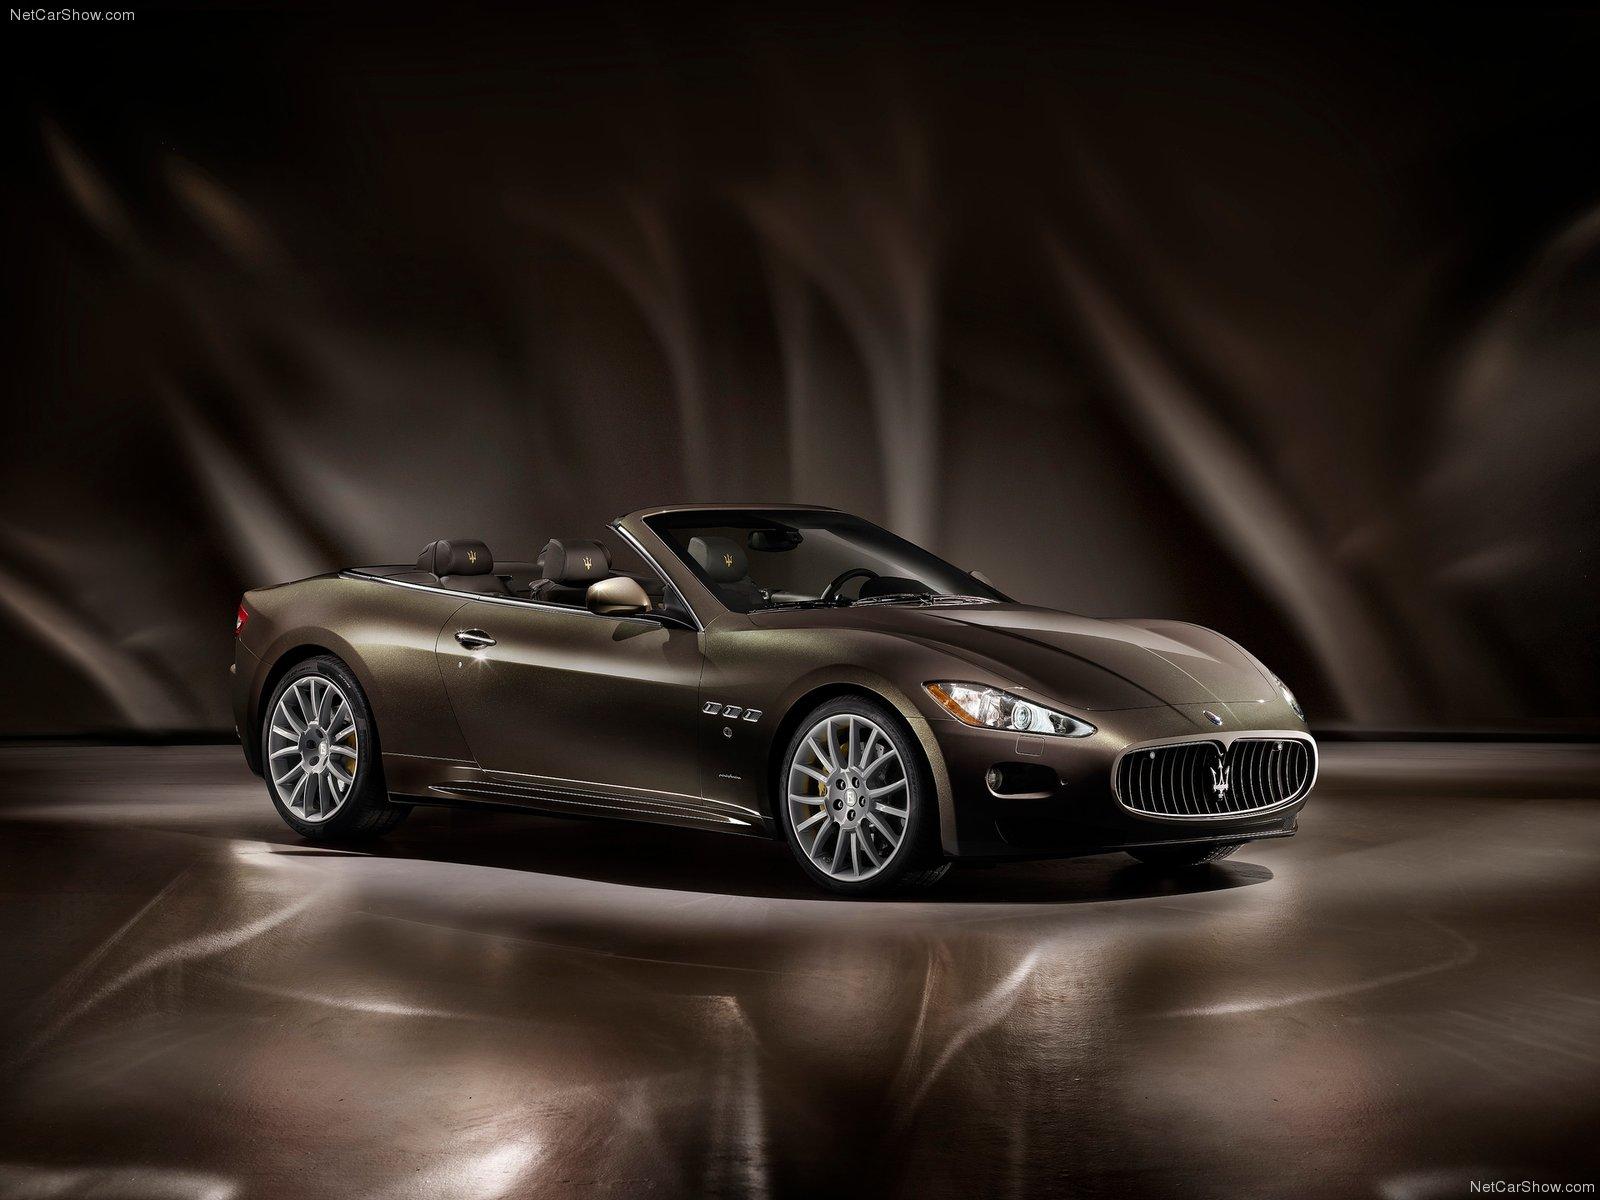 Hình ảnh siêu xe Maserati GranCabrio Fendi 2012 & nội ngoại thất